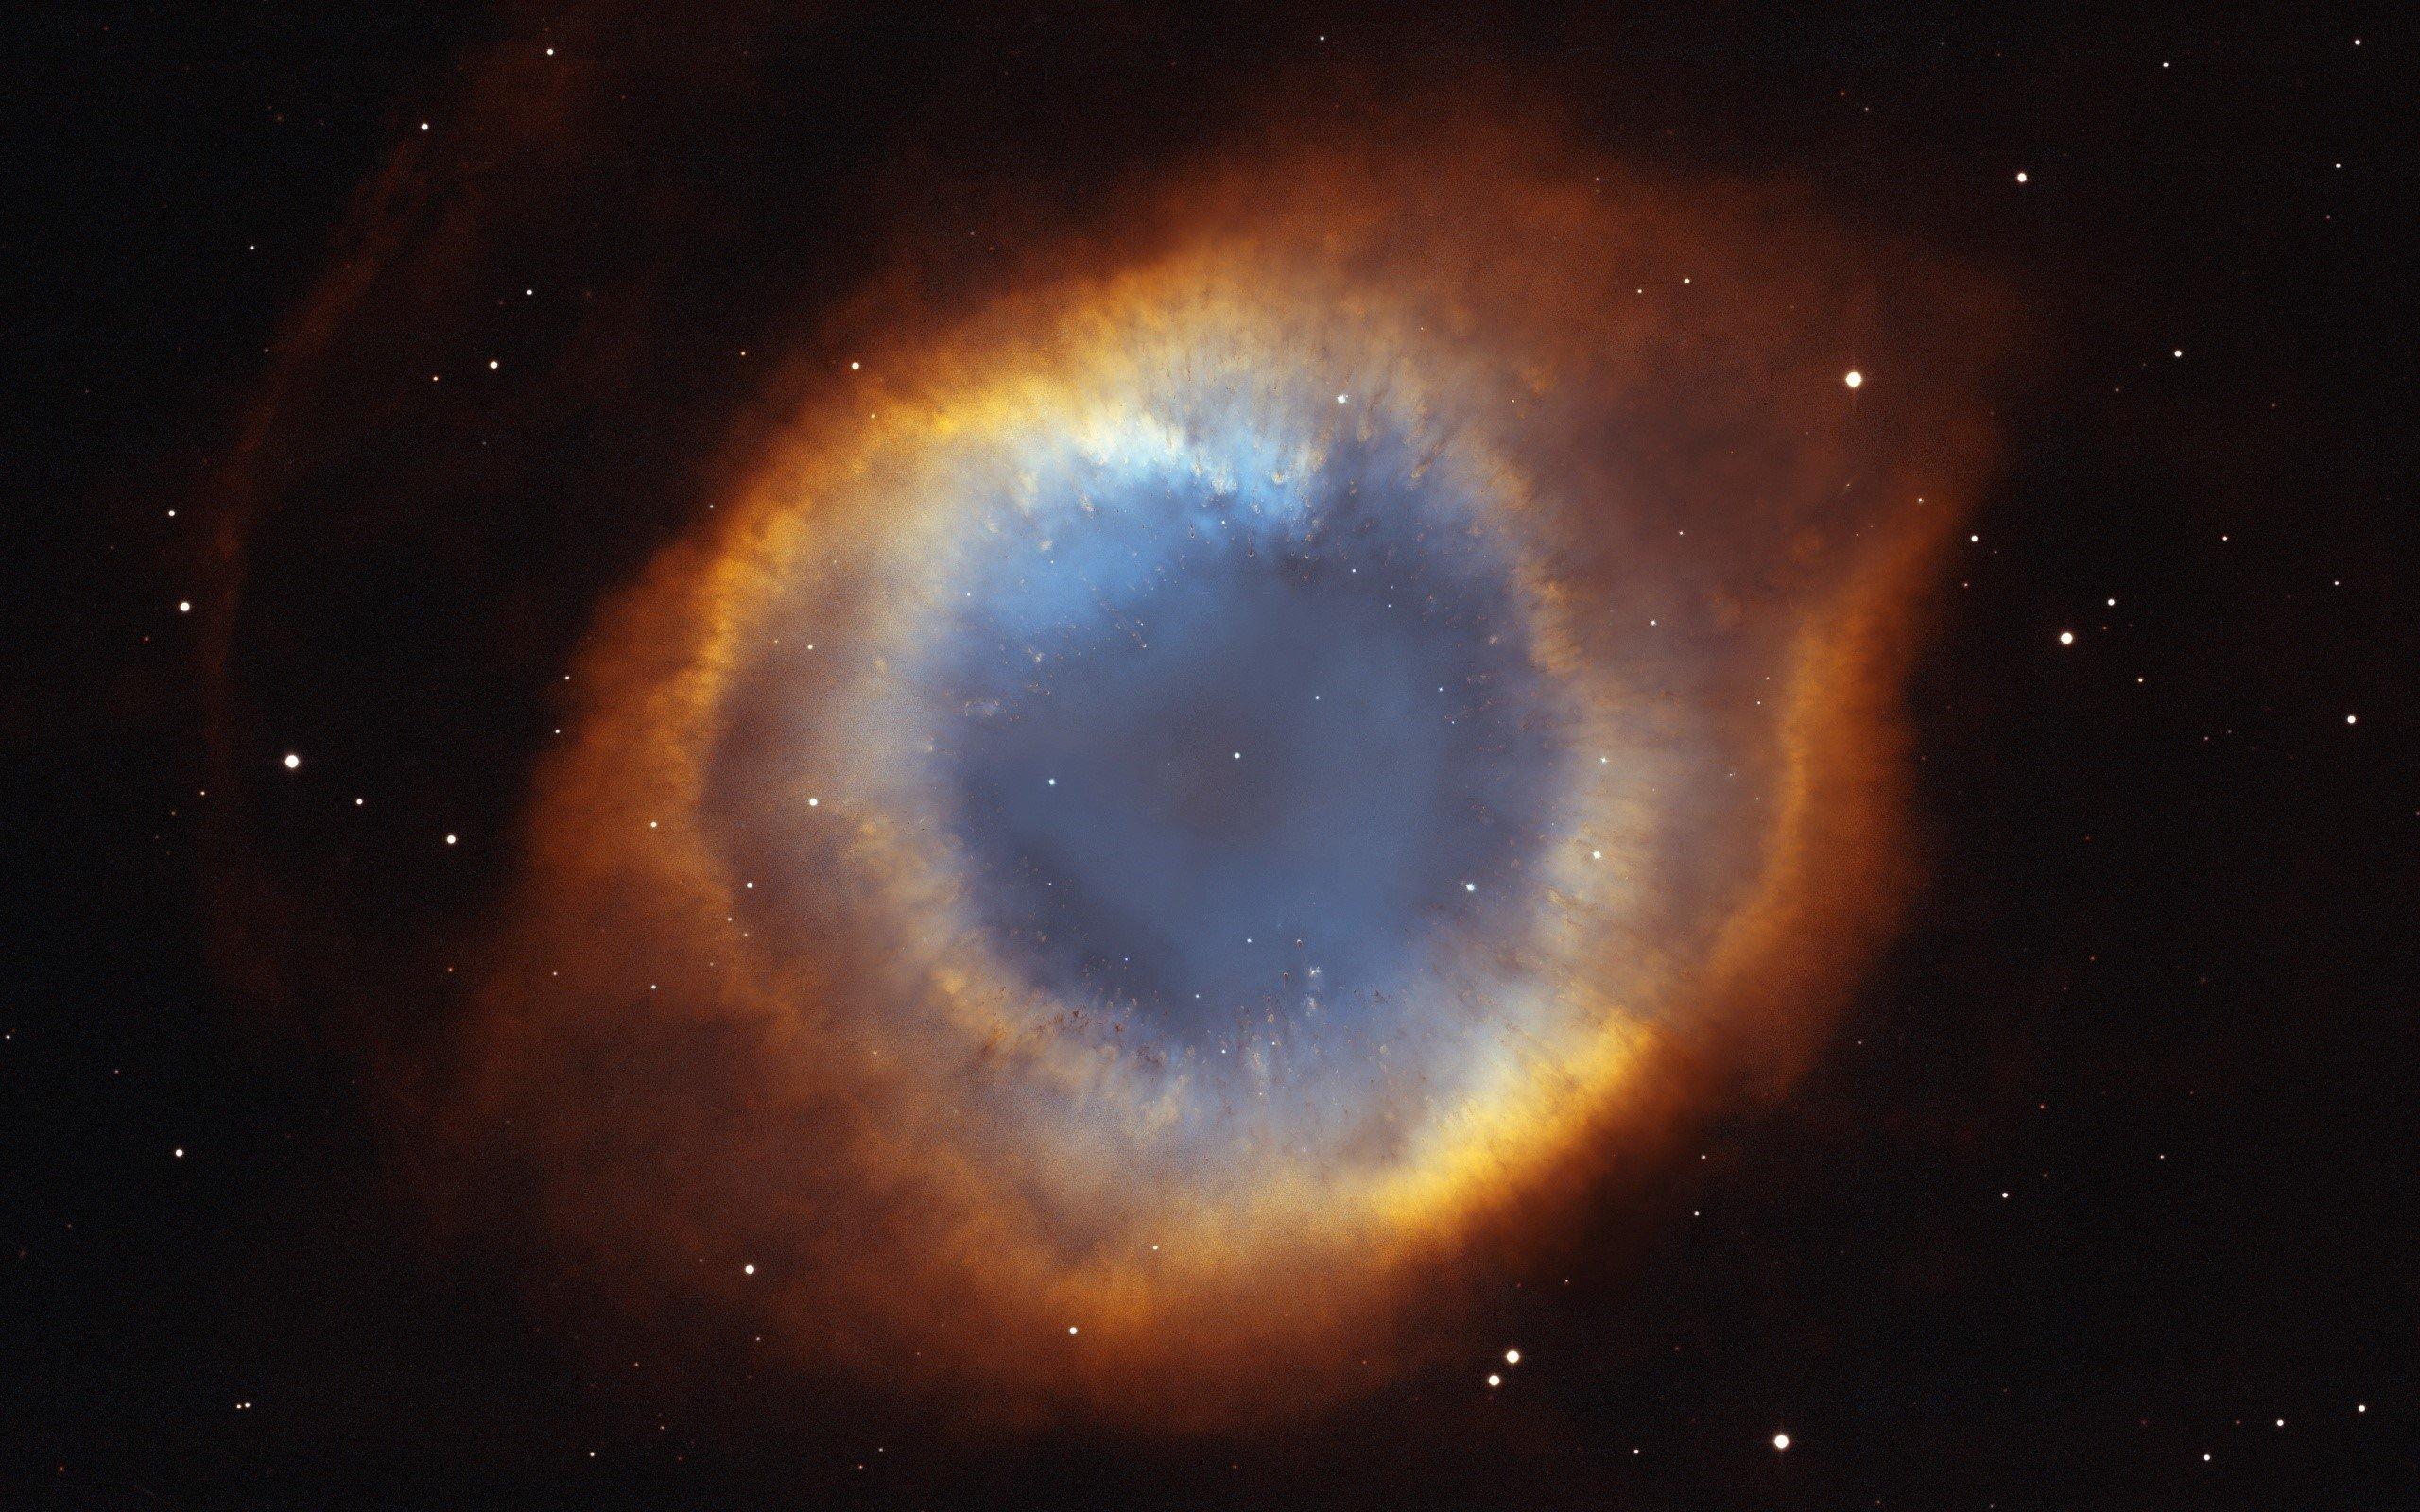 Wallpaper Nebula del espacio